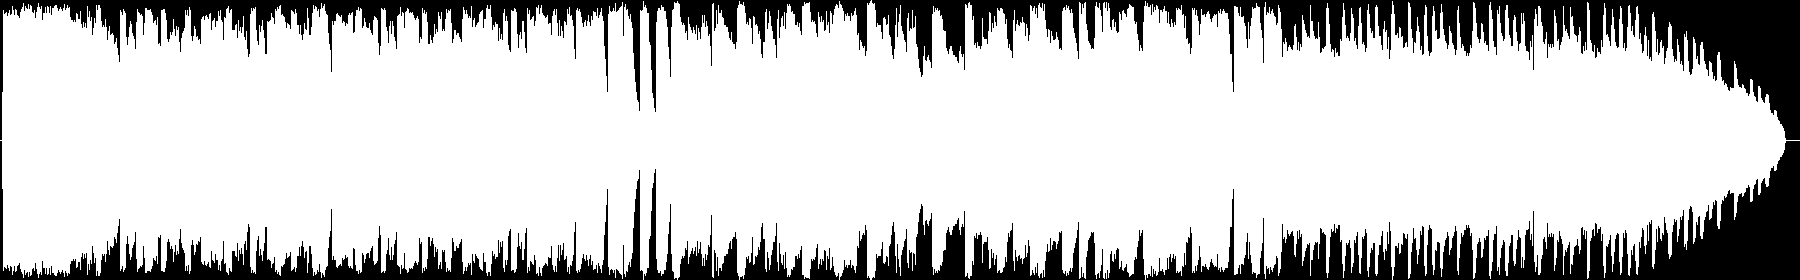 CYBR VX audio waveform